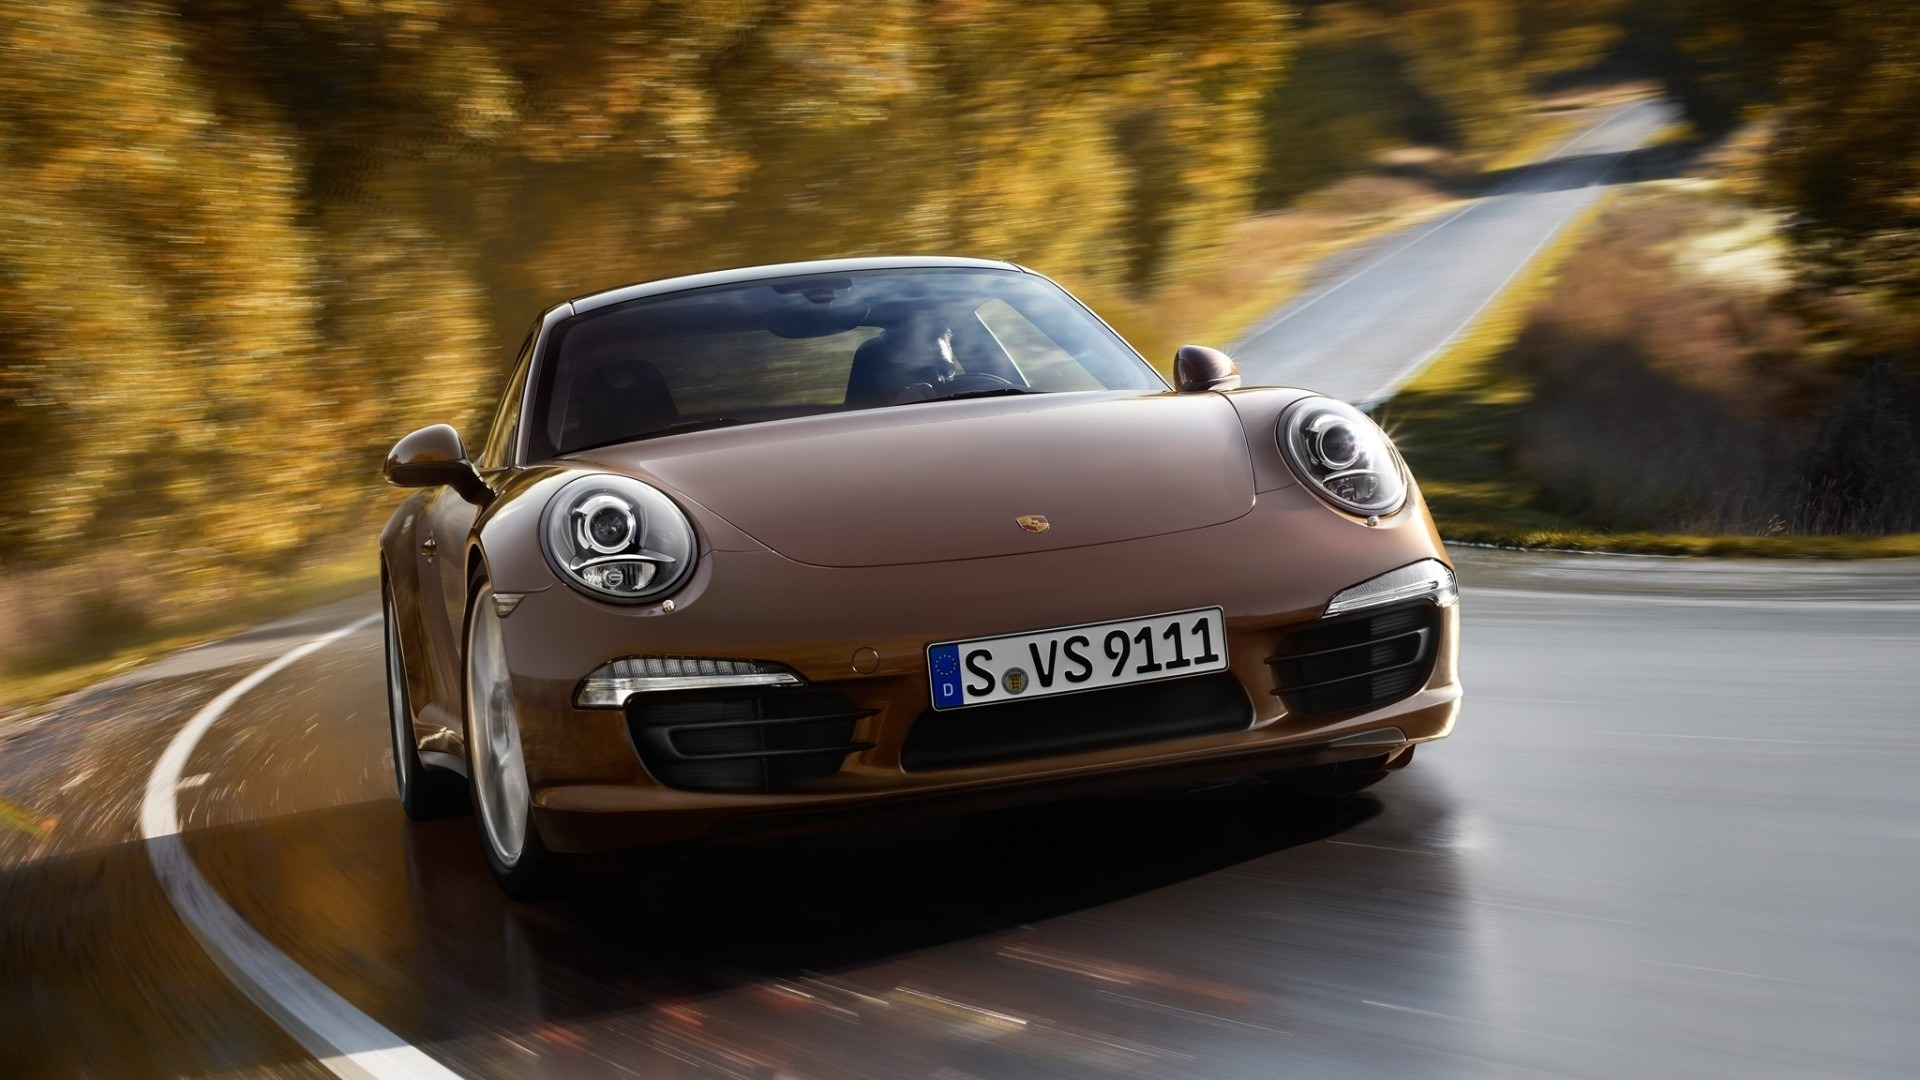 Porsche 911 HD Wallpapers 1080p Imagesize1920x1080 HD Wallpapers 1920x1080